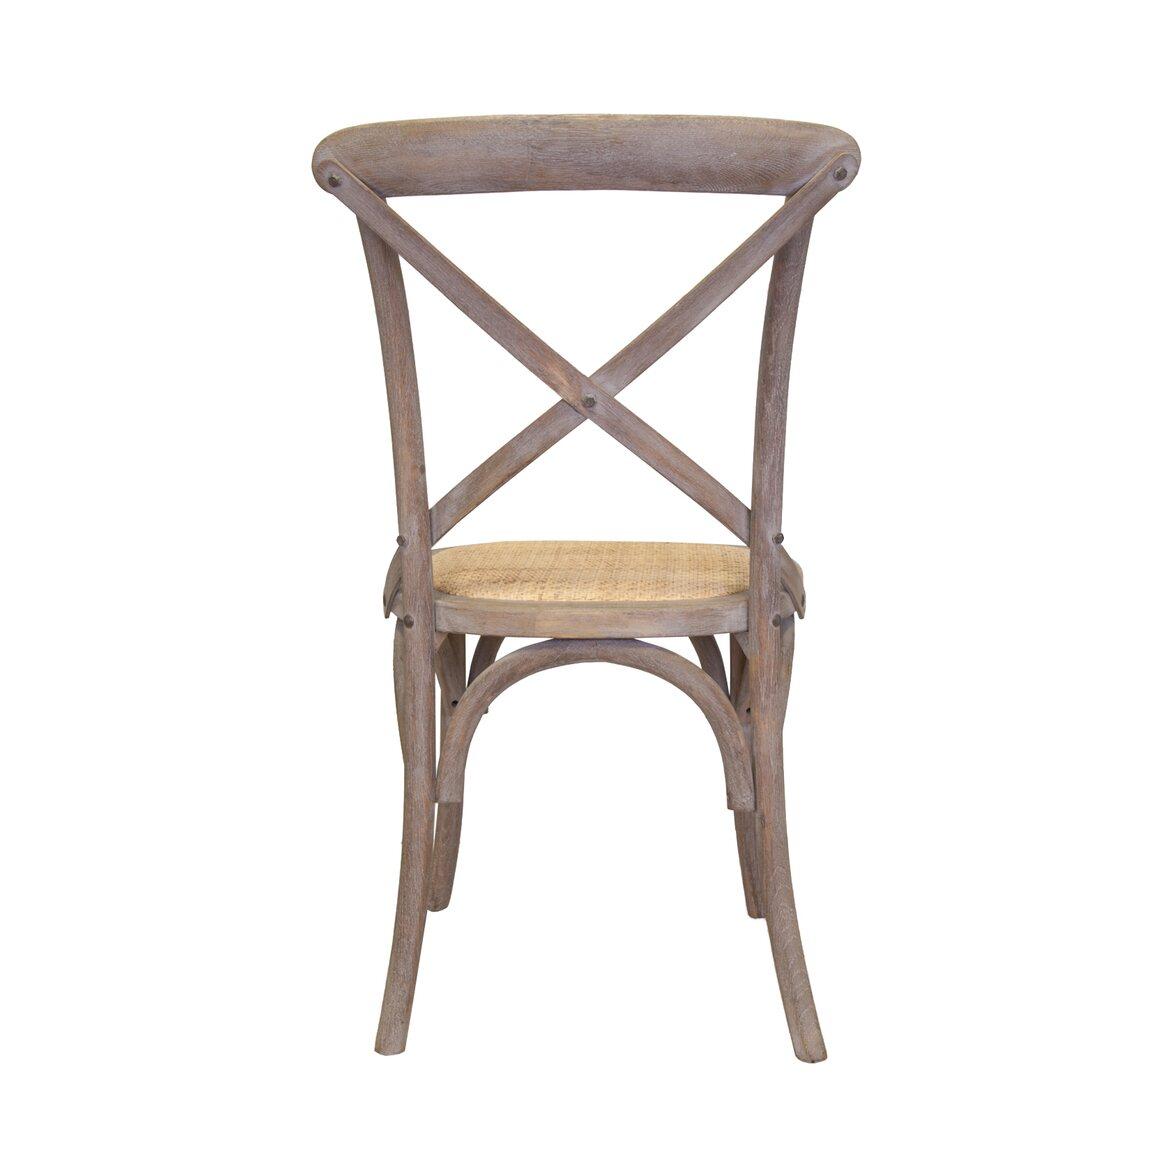 Стул Cross back old 3 | Обеденные стулья Kingsby